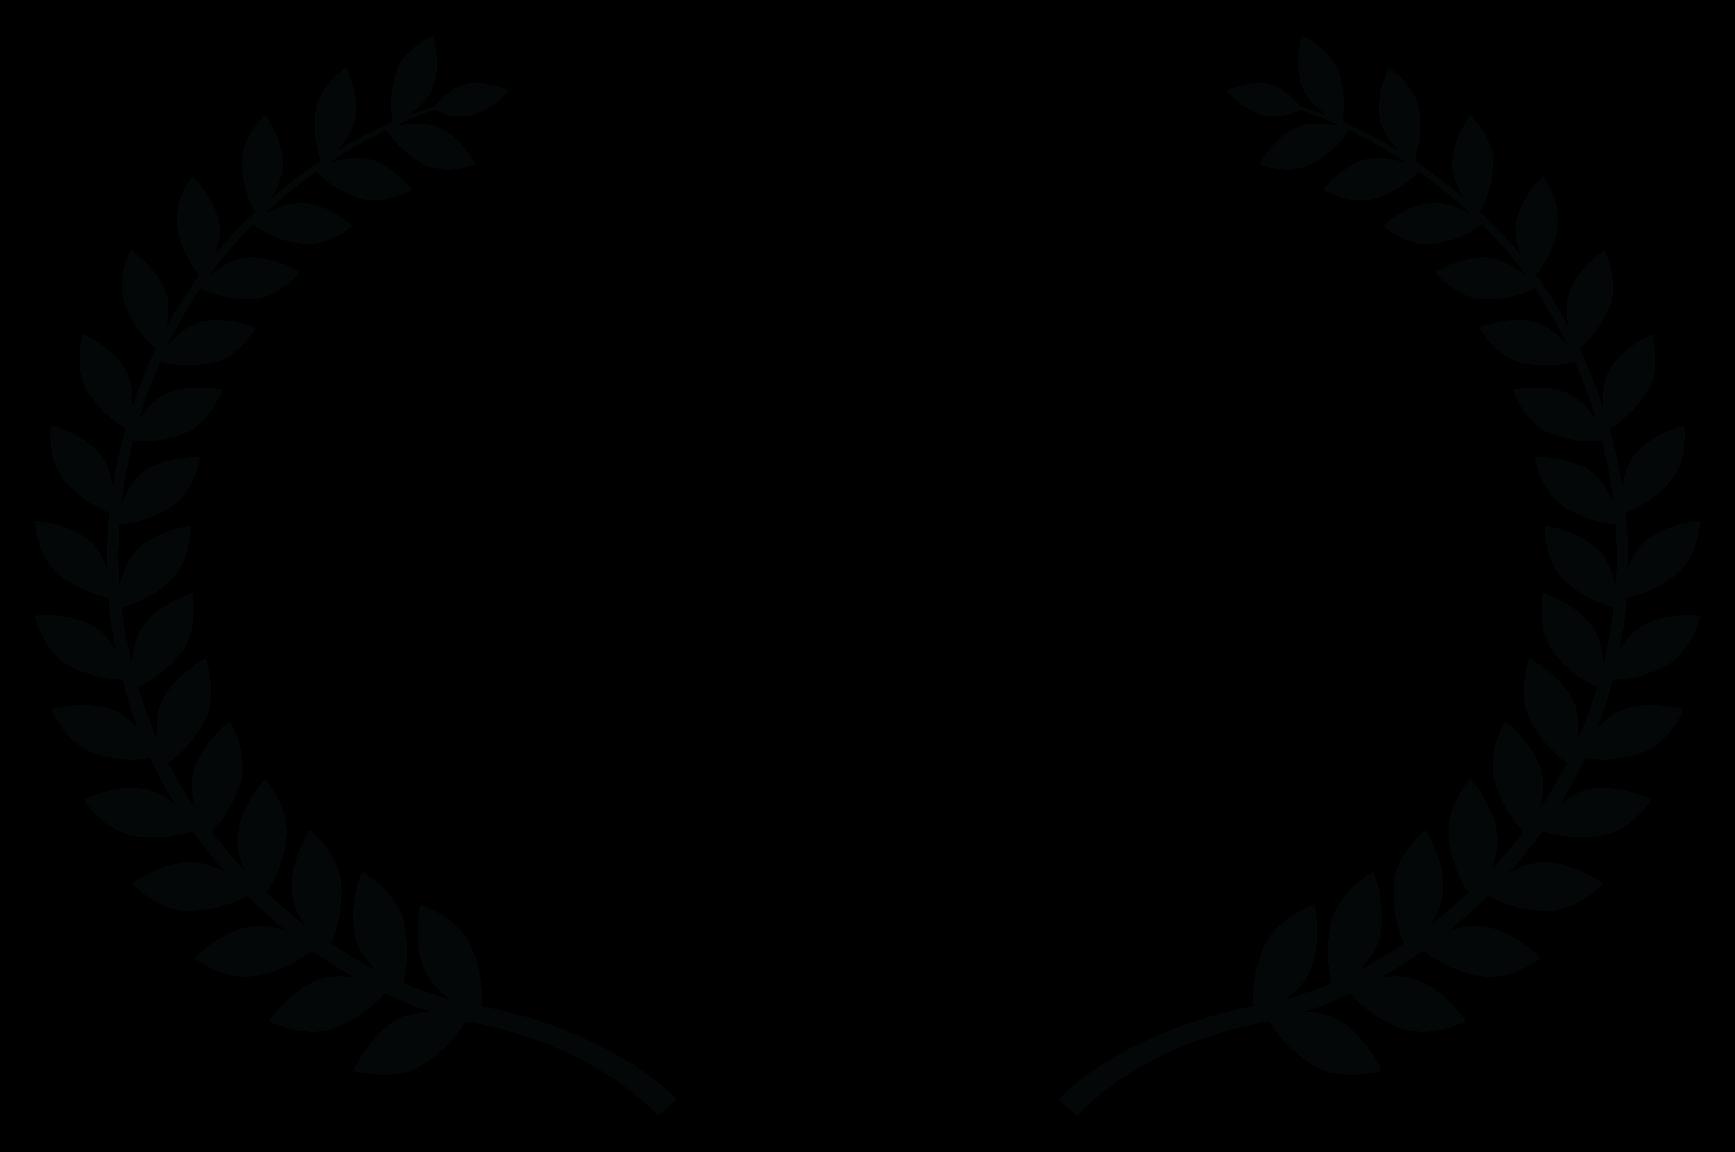 NOMINATION - BEST ACTRESS - MICHELE LYMAN - Actors Awards Los Angeles 2017.png